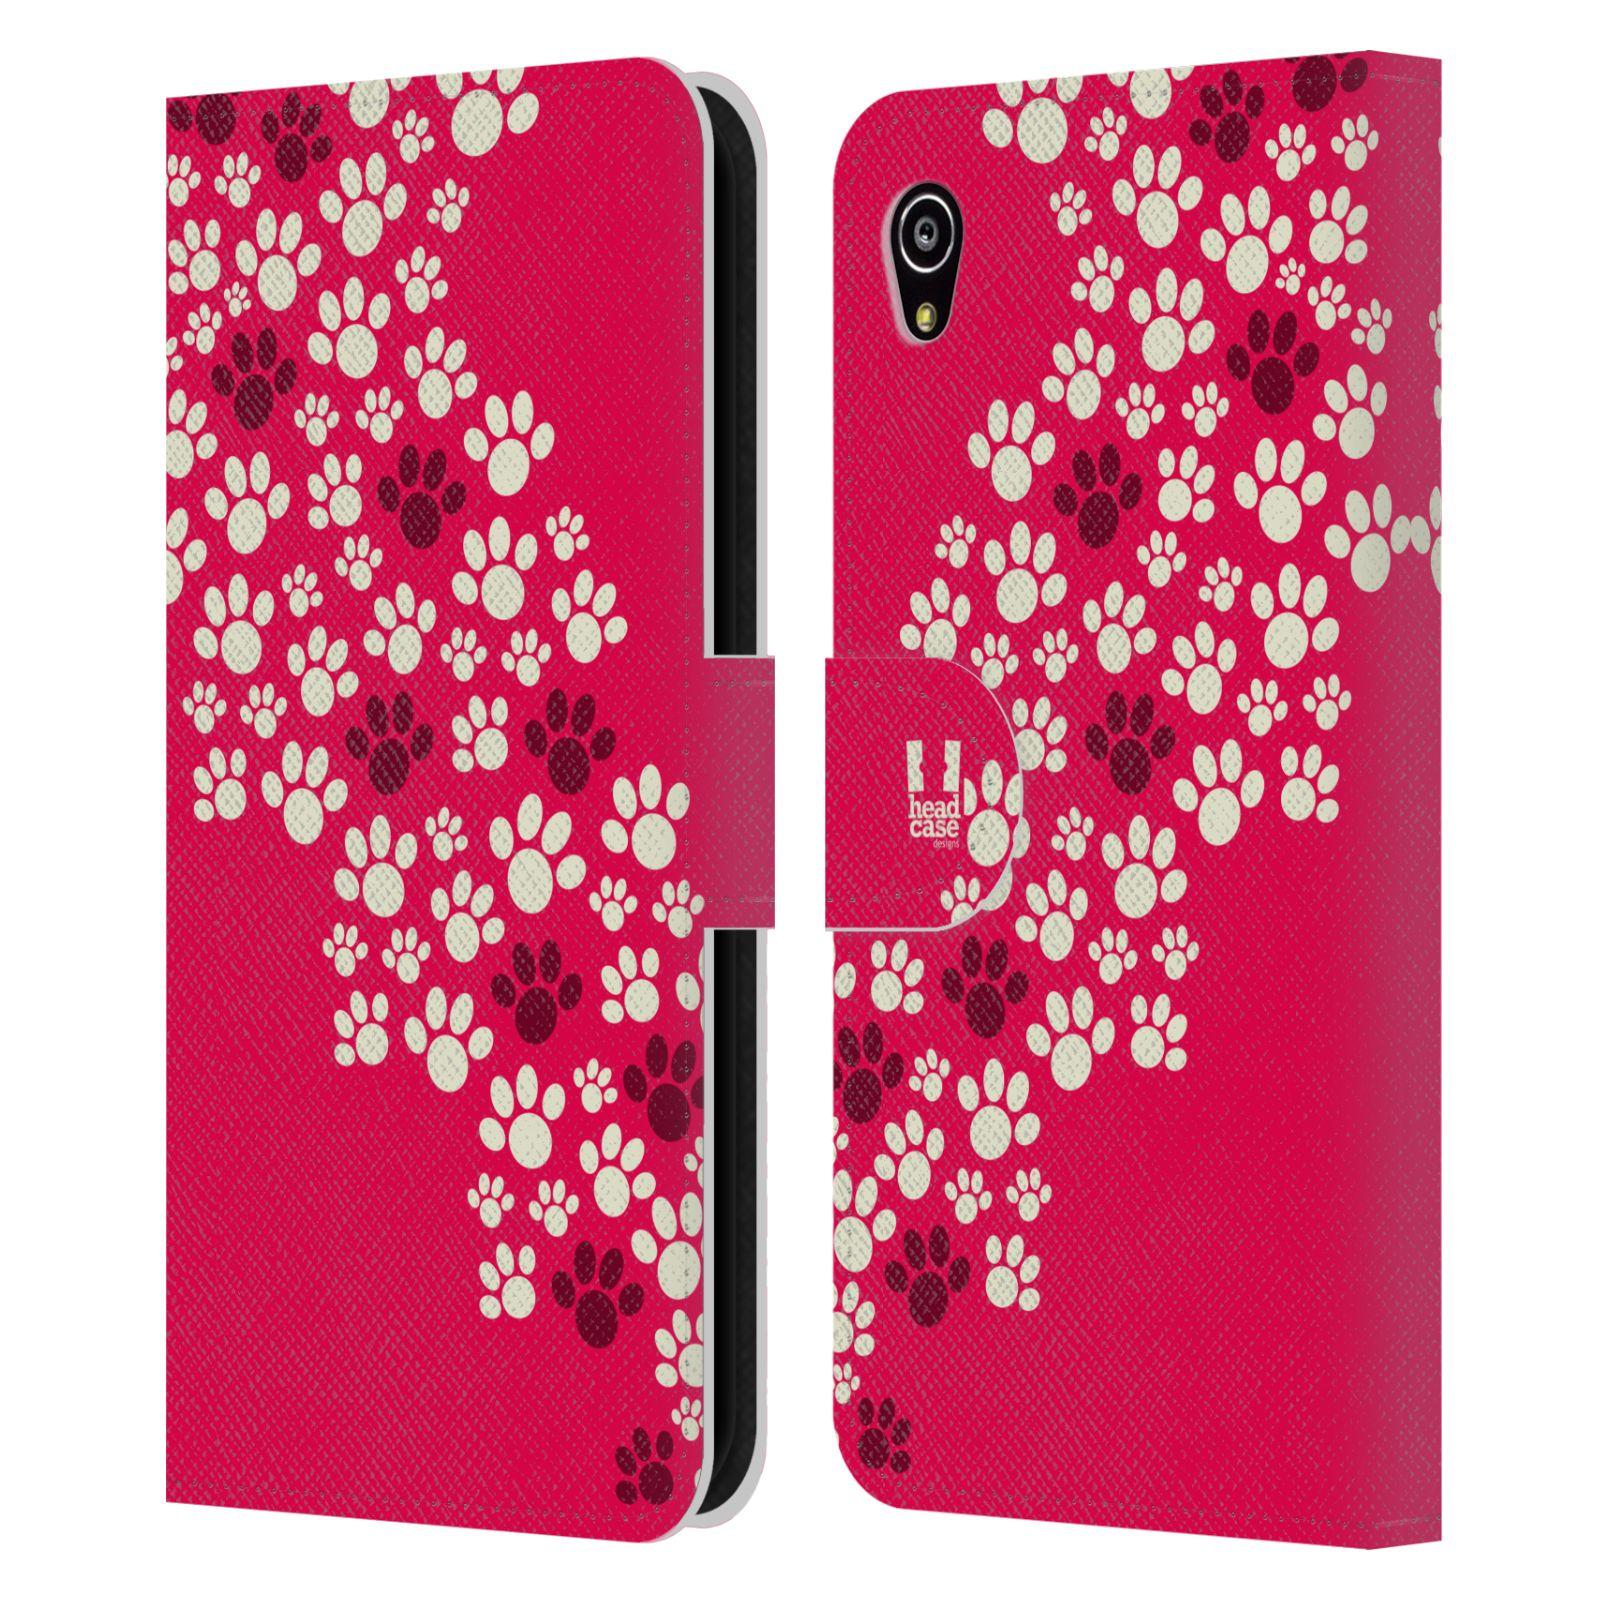 HEAD CASE Flipové pouzdro pro mobil SONY XPERIA M4 AQUA Pejsek ťapky růžová barva